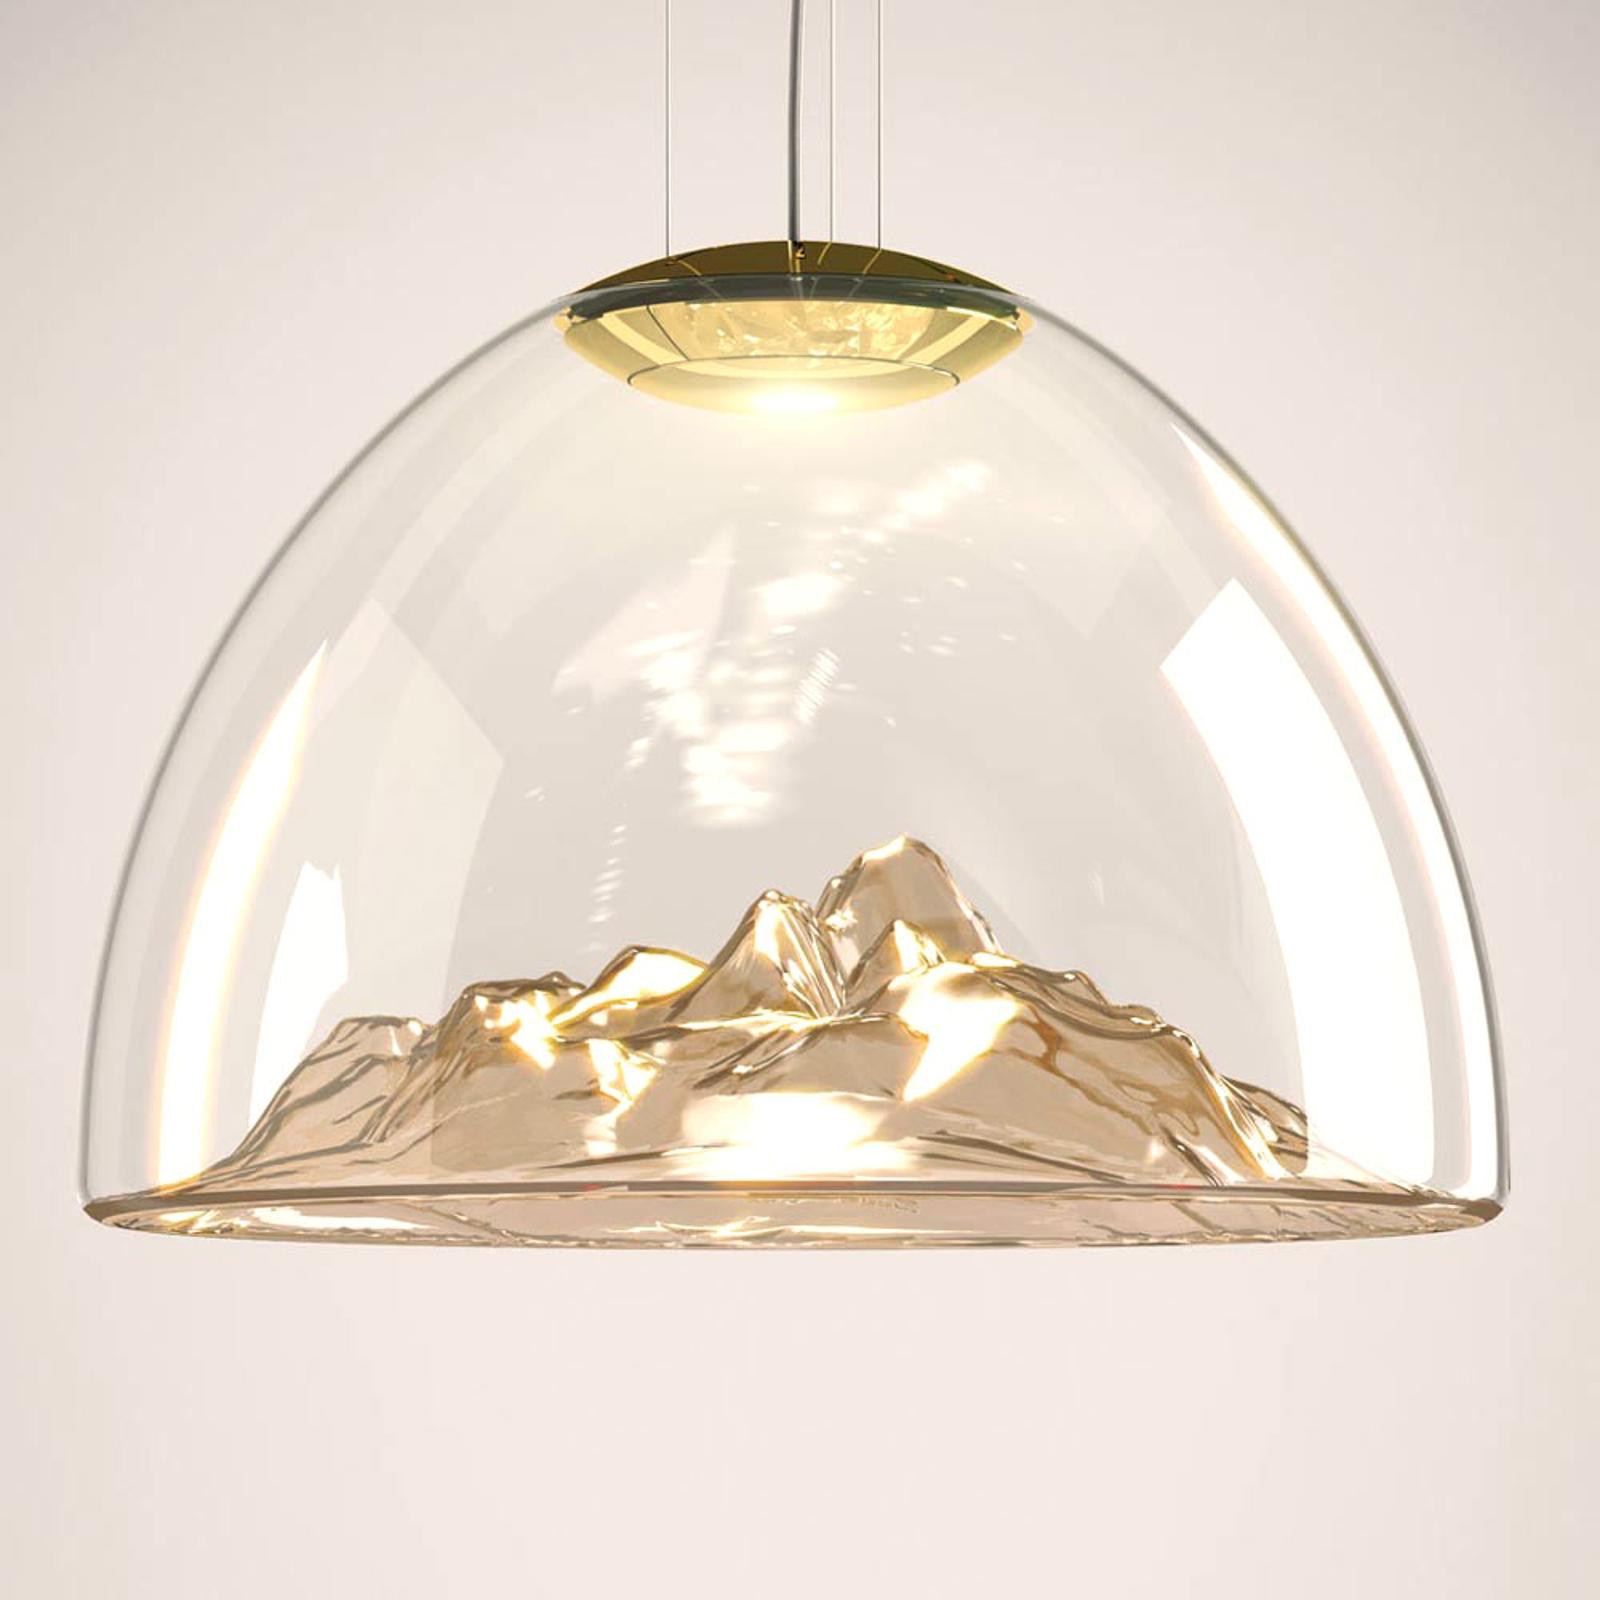 Axolight Mountain View LED hanglamp amber-goud